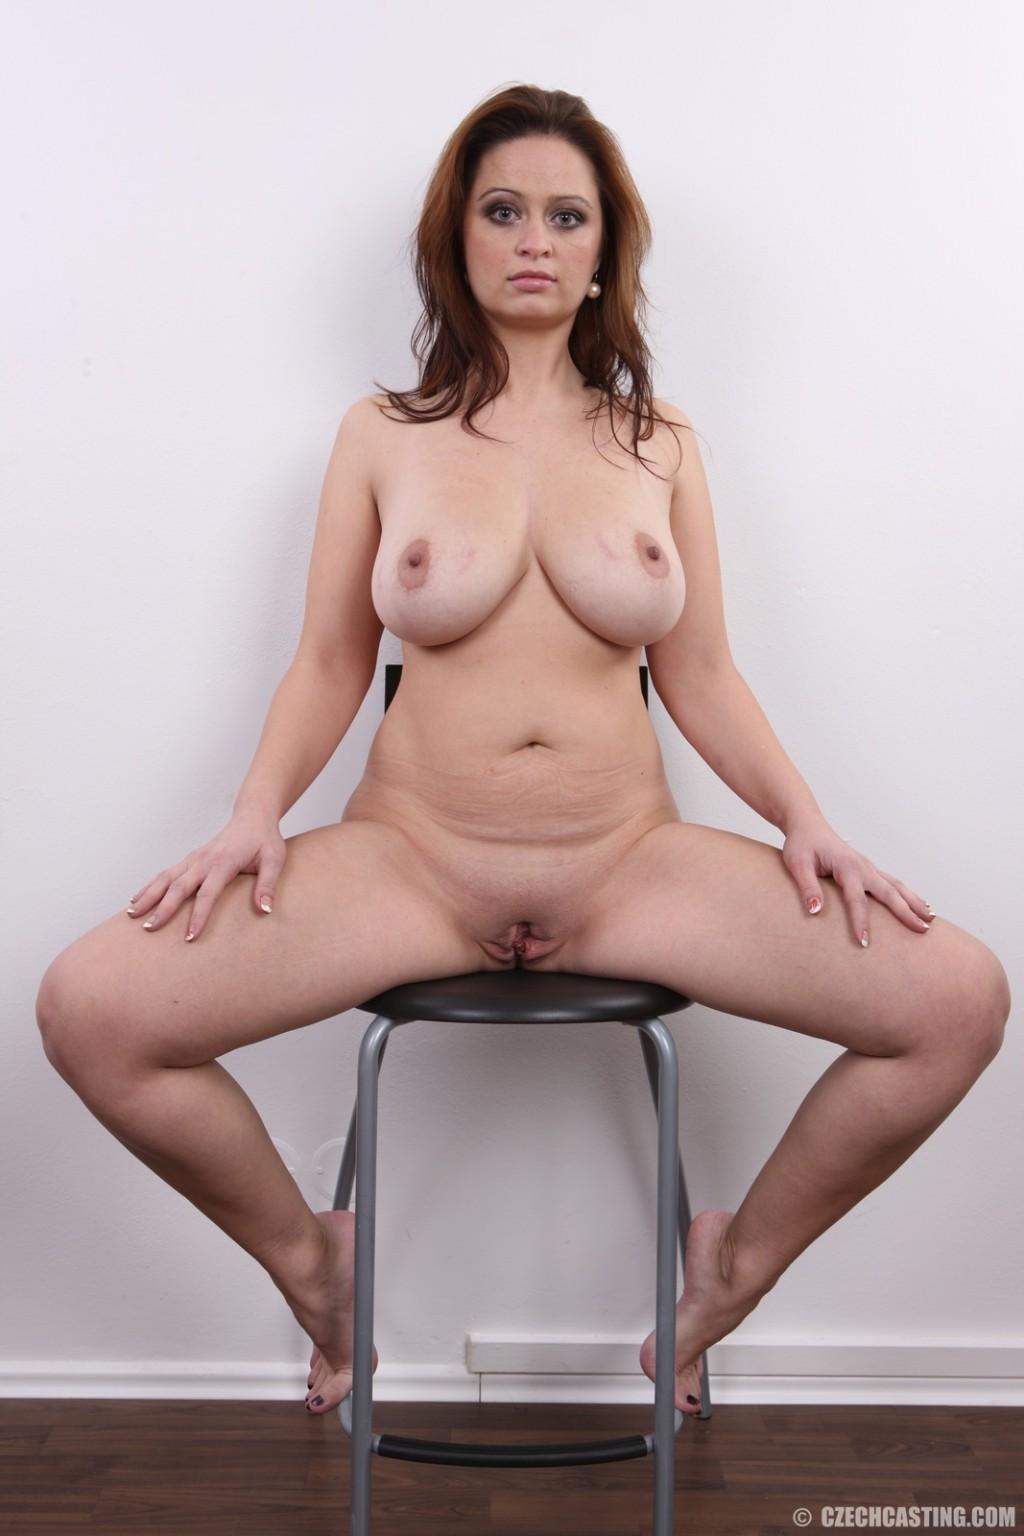 Big Tits Thick Curvy Mature